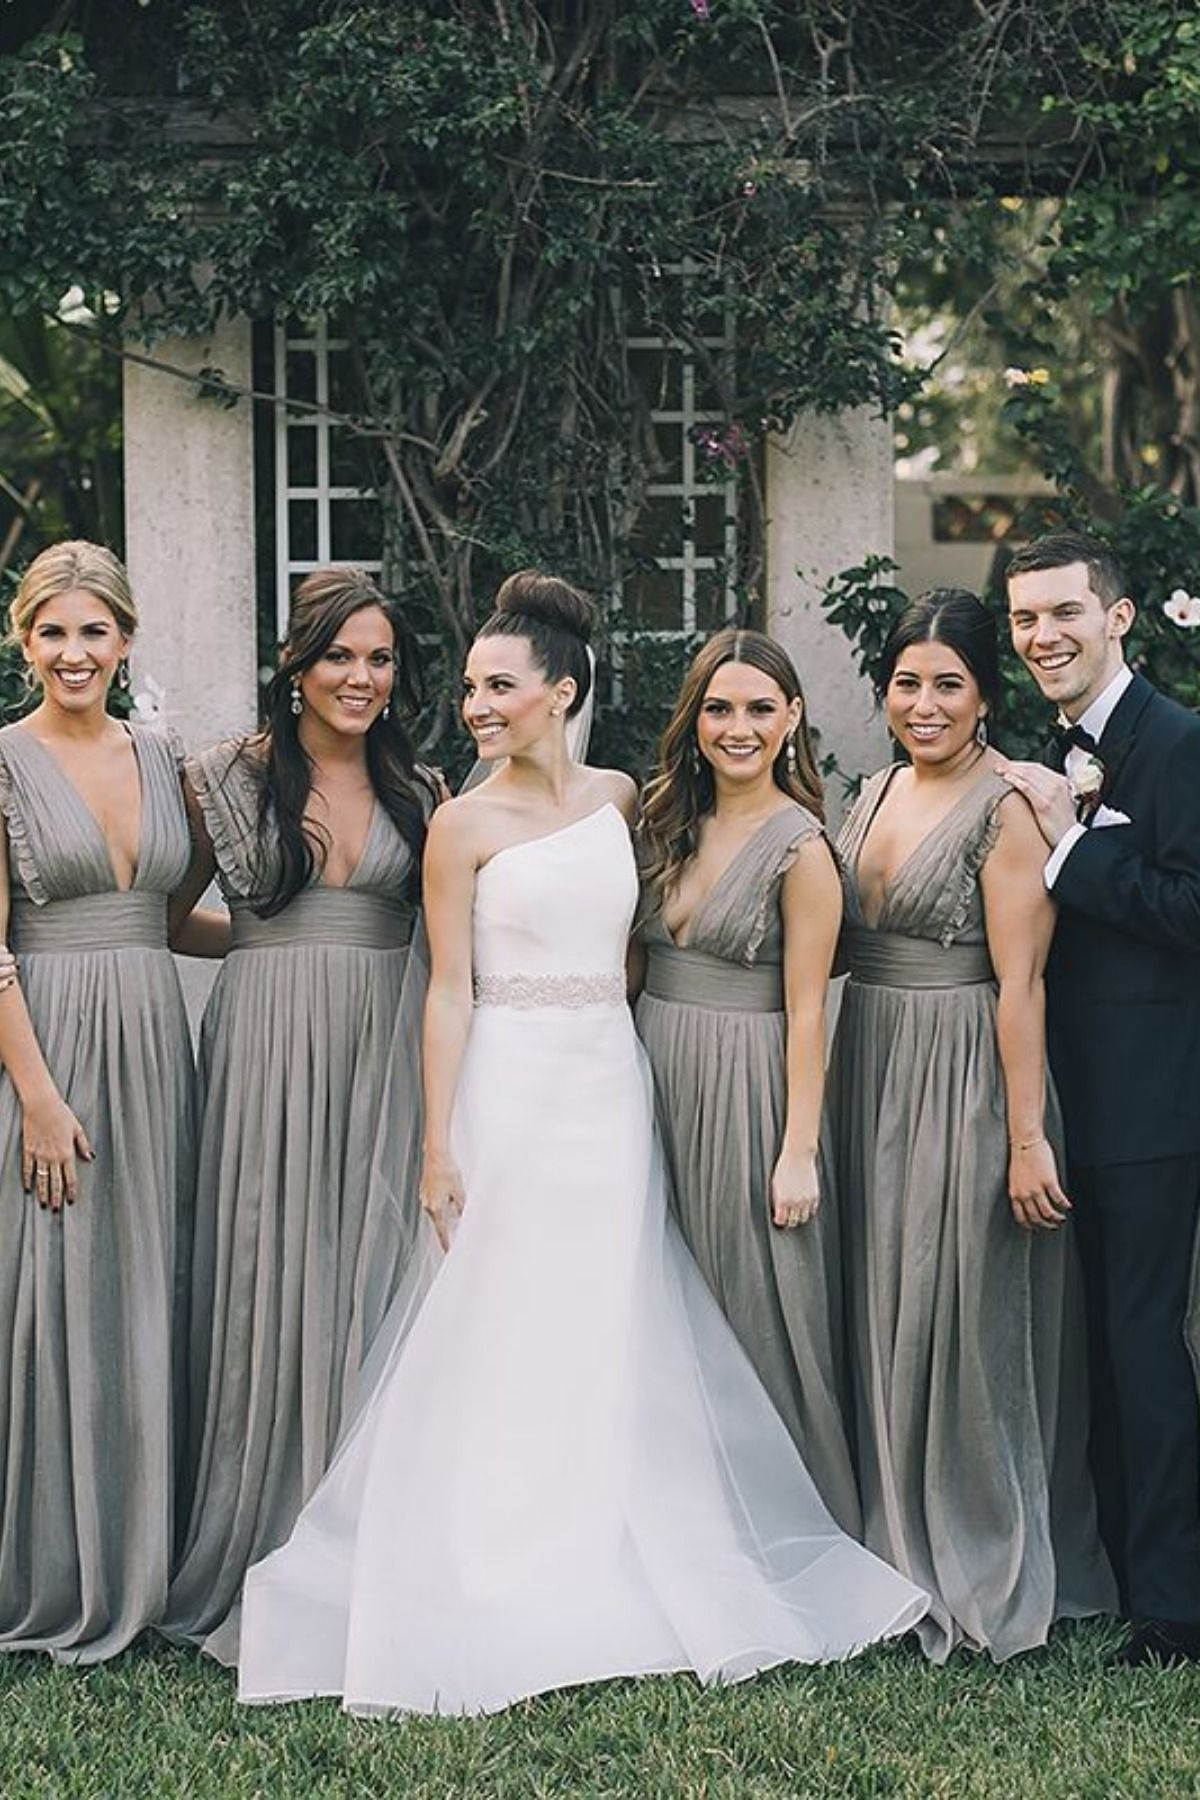 Stunning indoor Florida wedding bridal party at Flagler